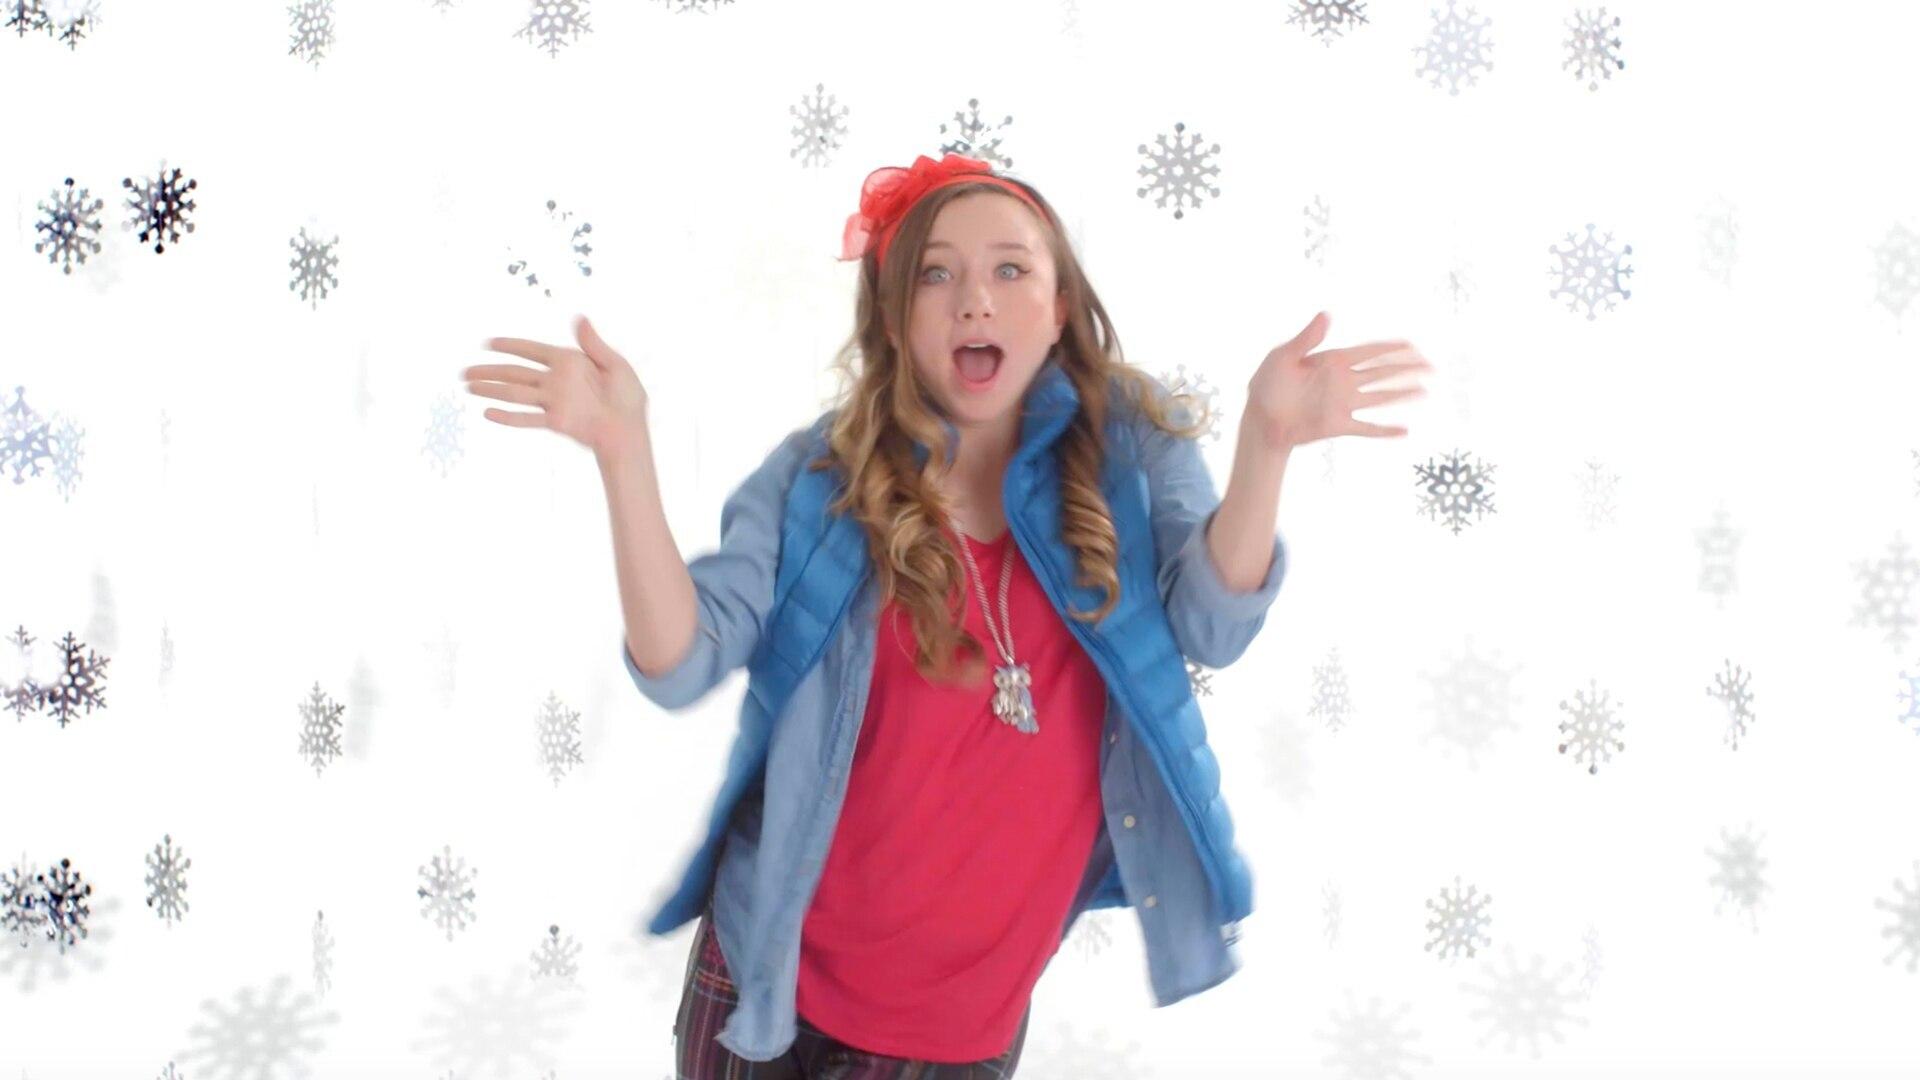 Kidz Bop Kids -Let It Snow! Let It Snow! Let It Snow!